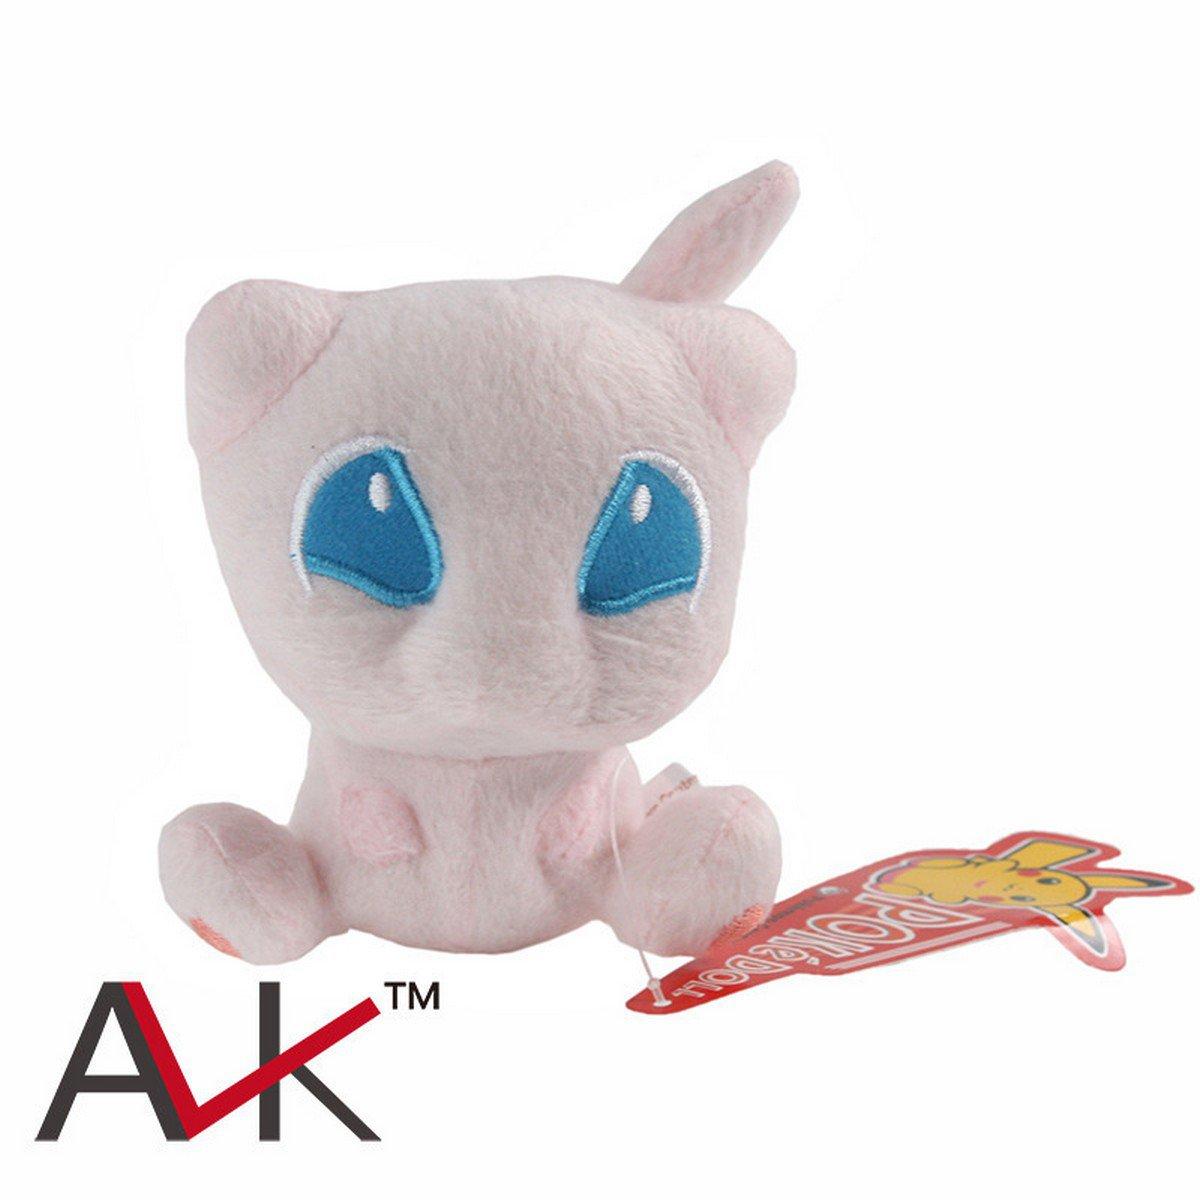 Buy 5PCSLOT Mini Pokemon Figure Plush Doll Toy 12CM Musharna Pikachu Charmander Gengar Bulbasaur Su